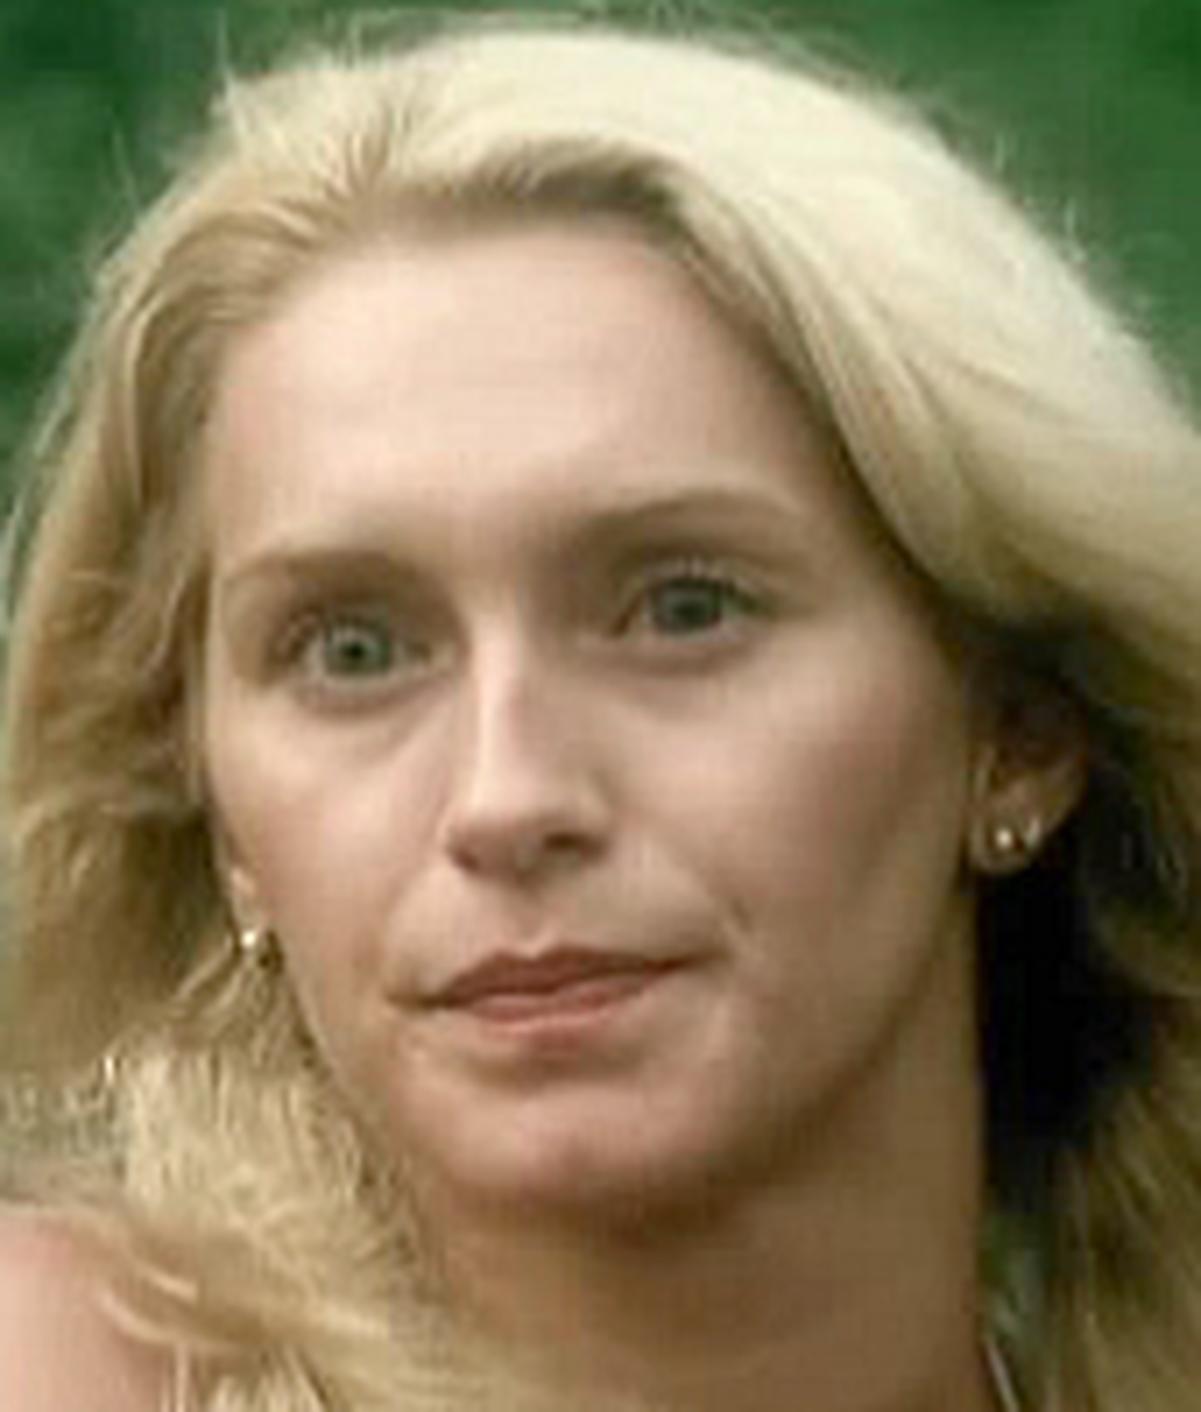 Dalileia Ayala